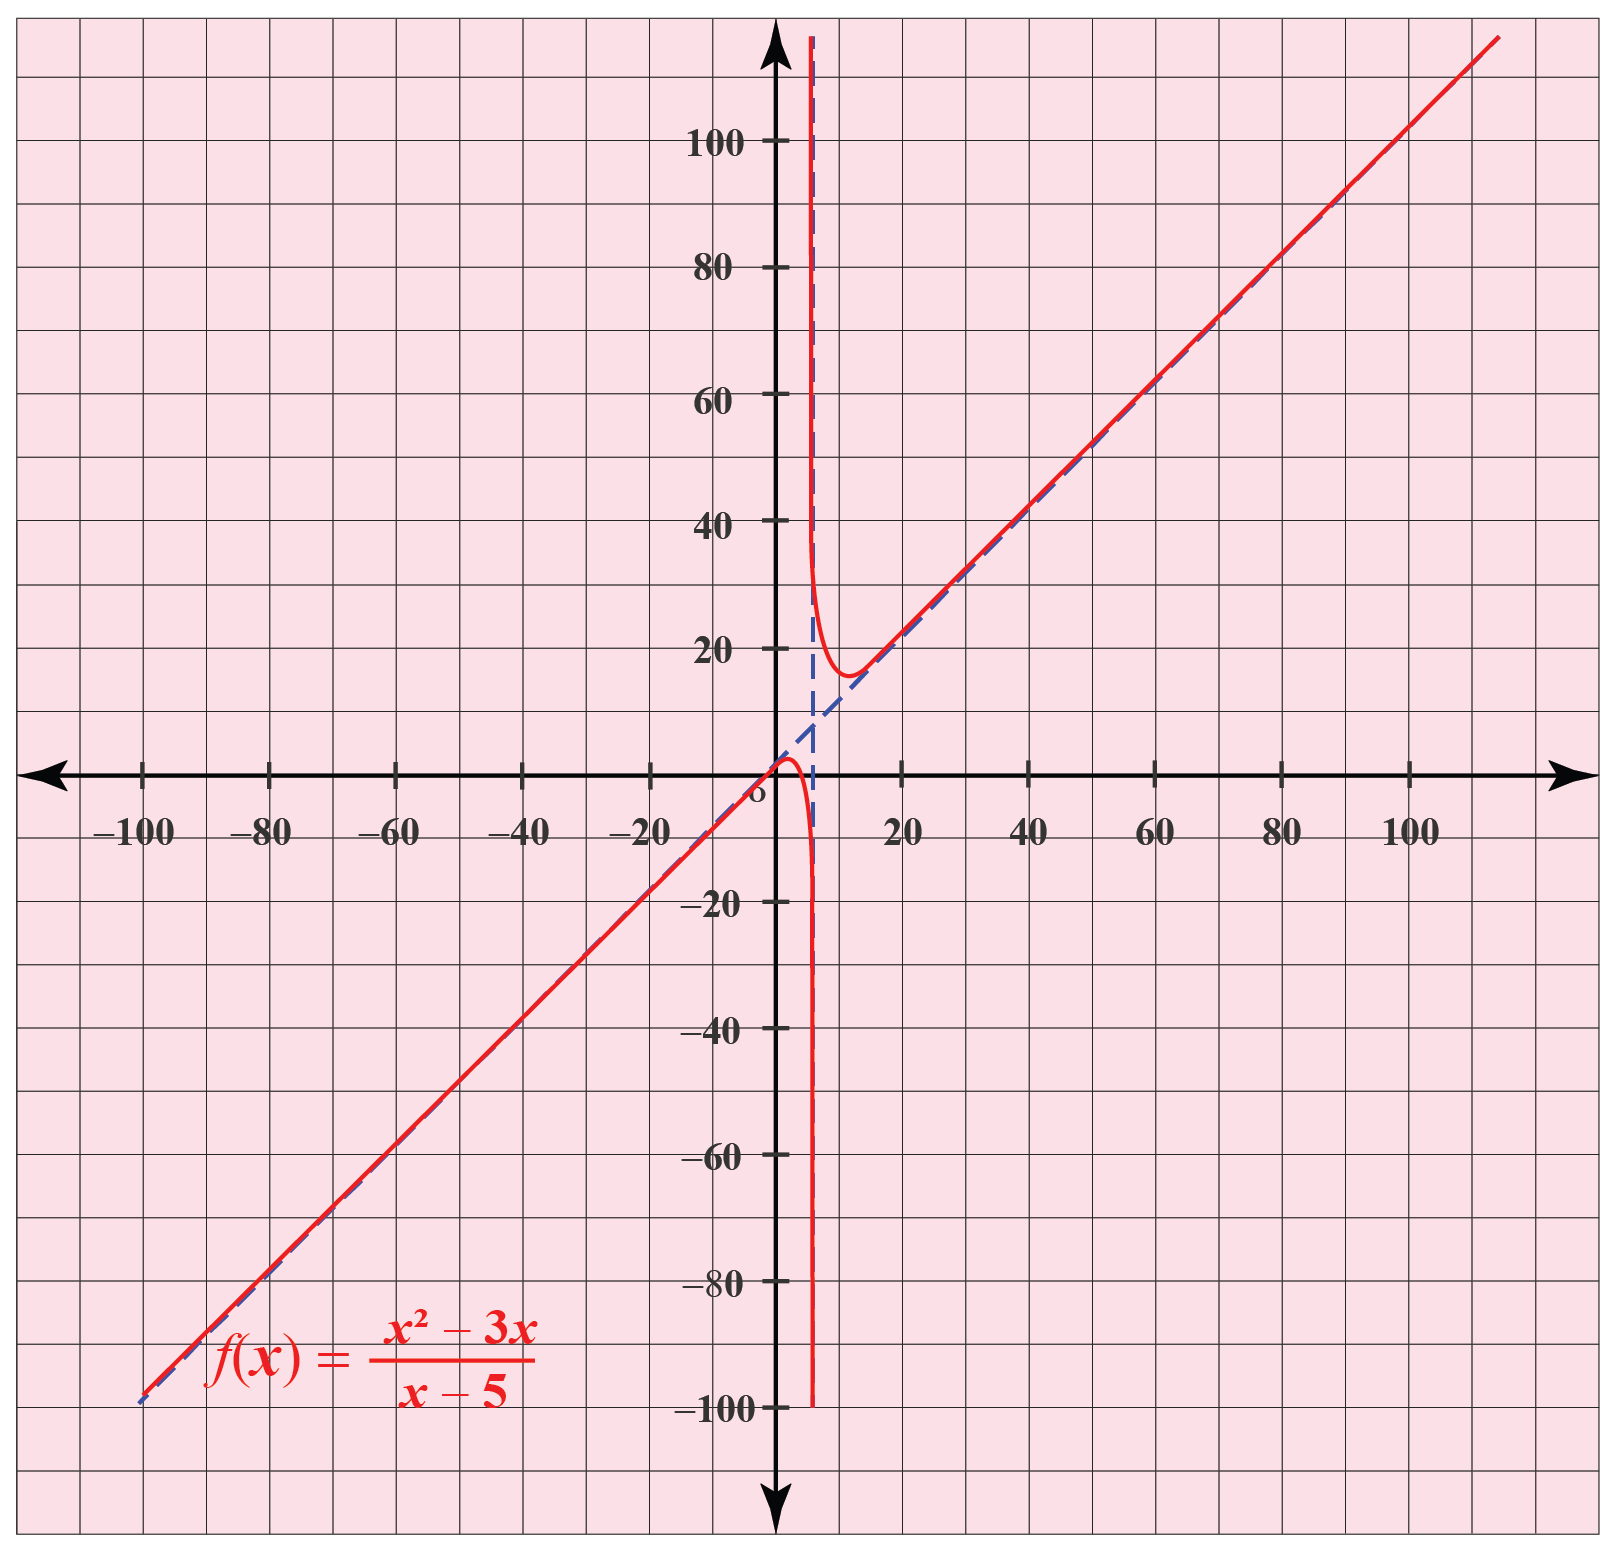 asymptotes of graph f(x)=\frac{x^{2}-3 x}{x-5}